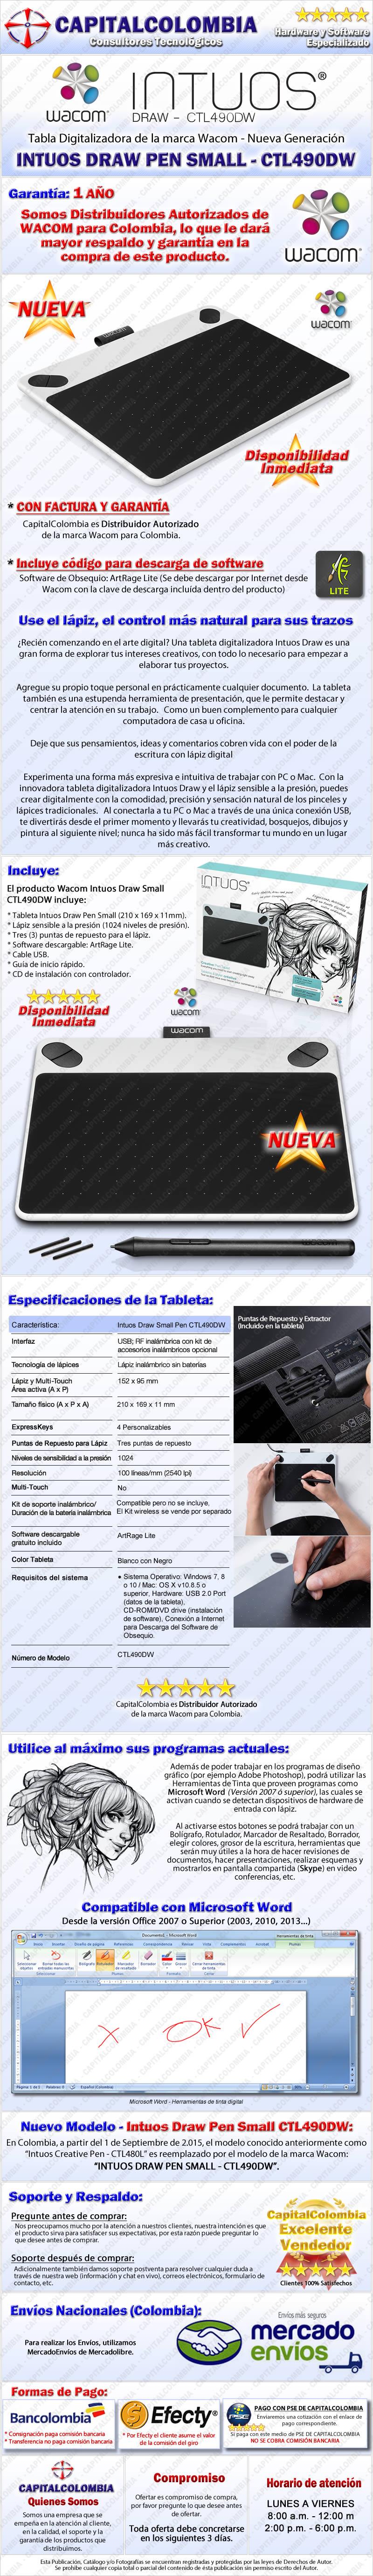 Tableta Wacom Intuos Draw Pen CTL490dw